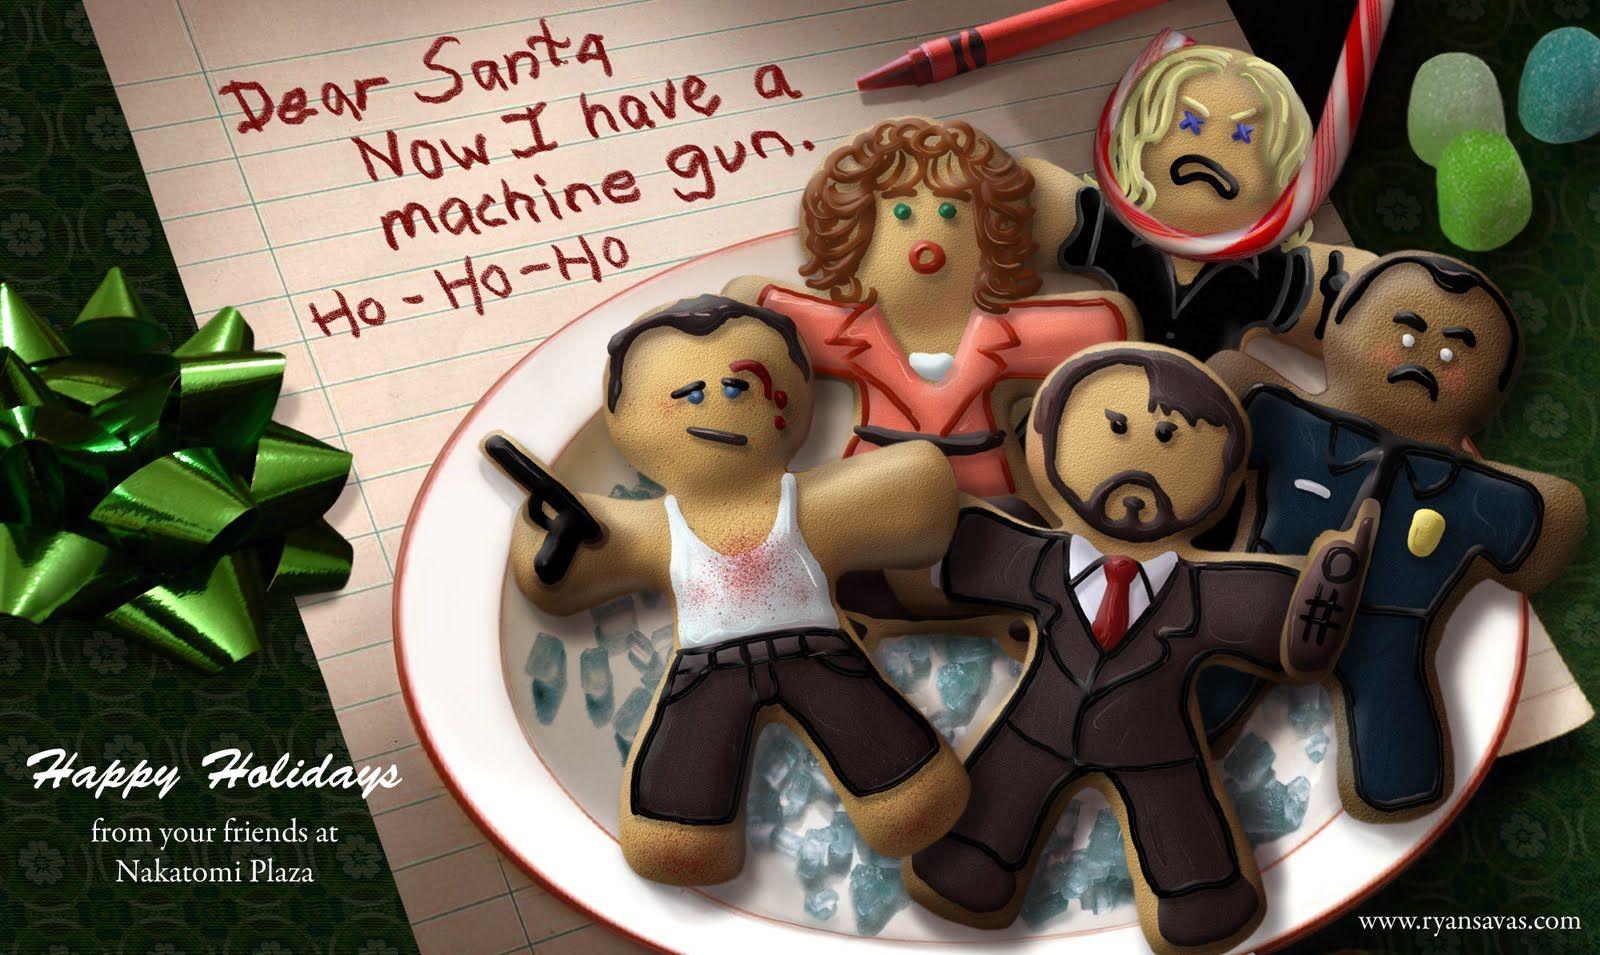 Alan Rickman looks delicious as a Hans Gruber Christmas cookie ...